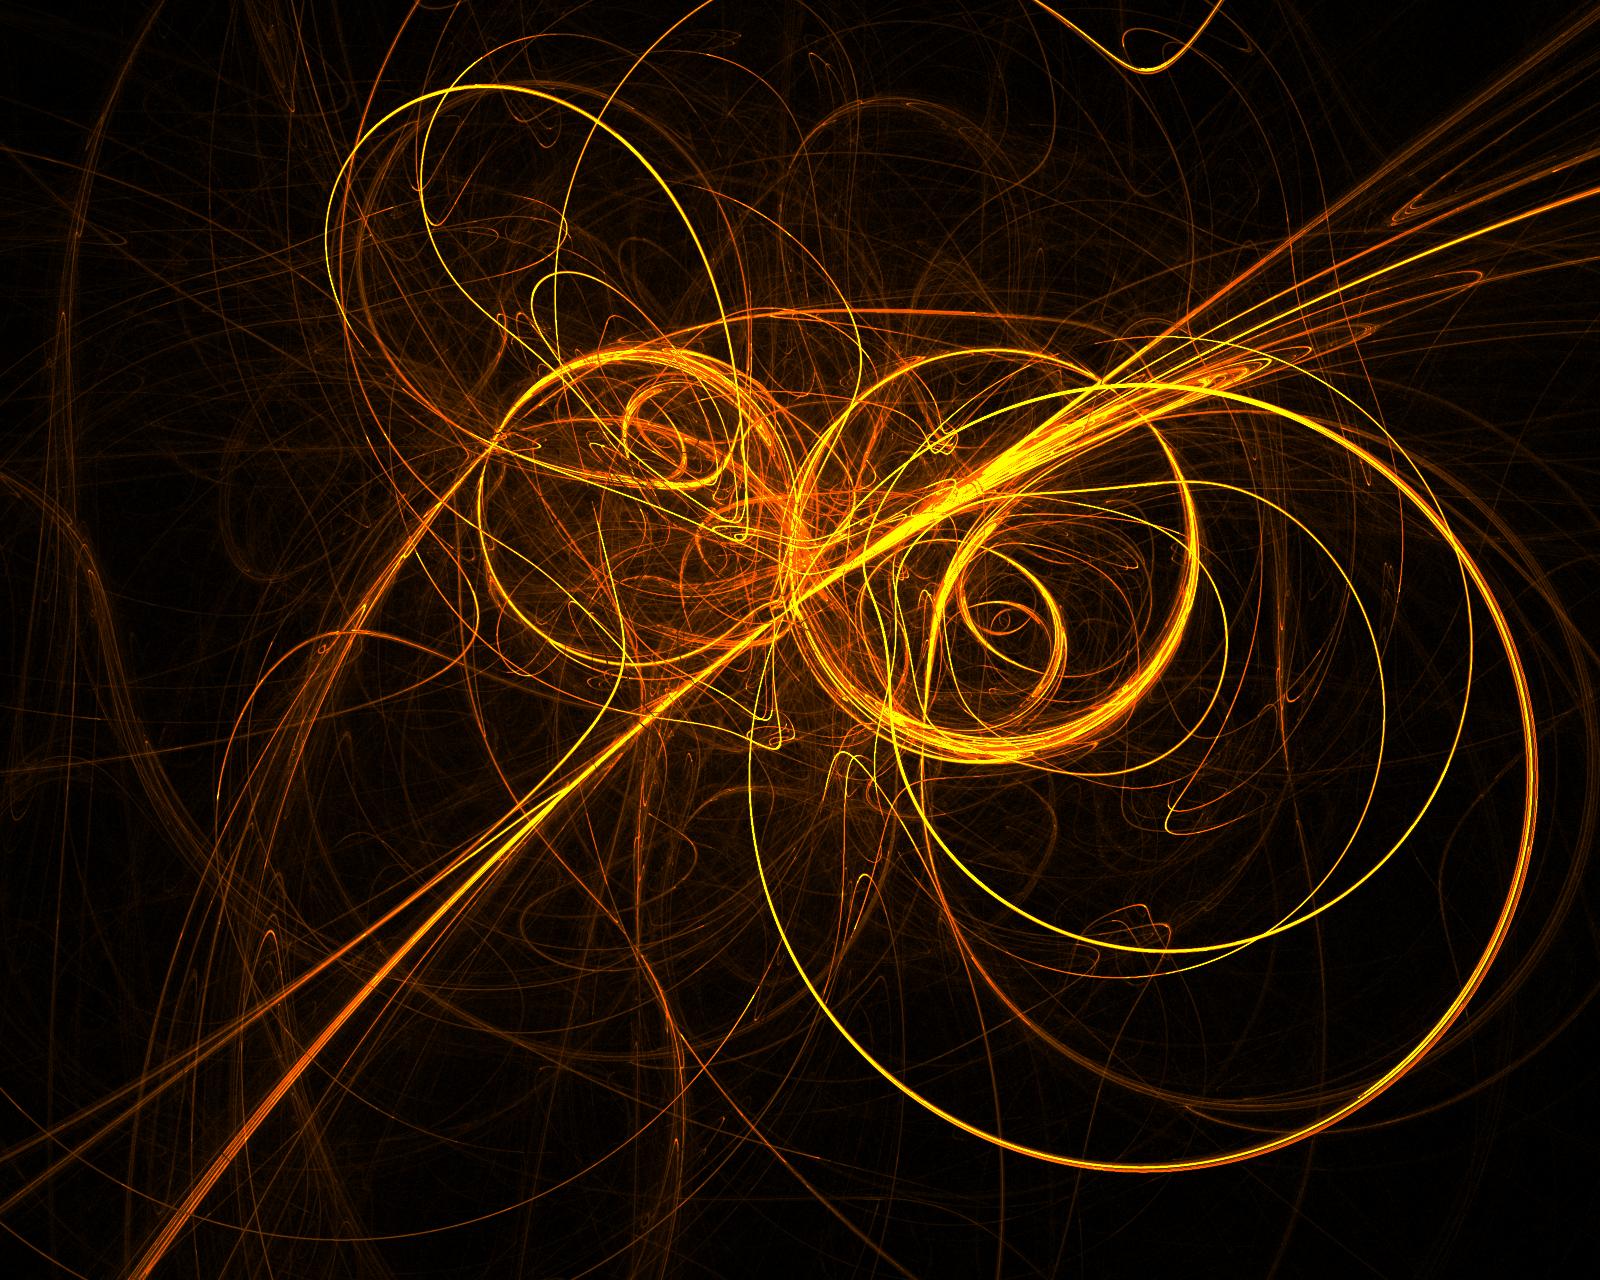 Golden Swirl Gimp Flame